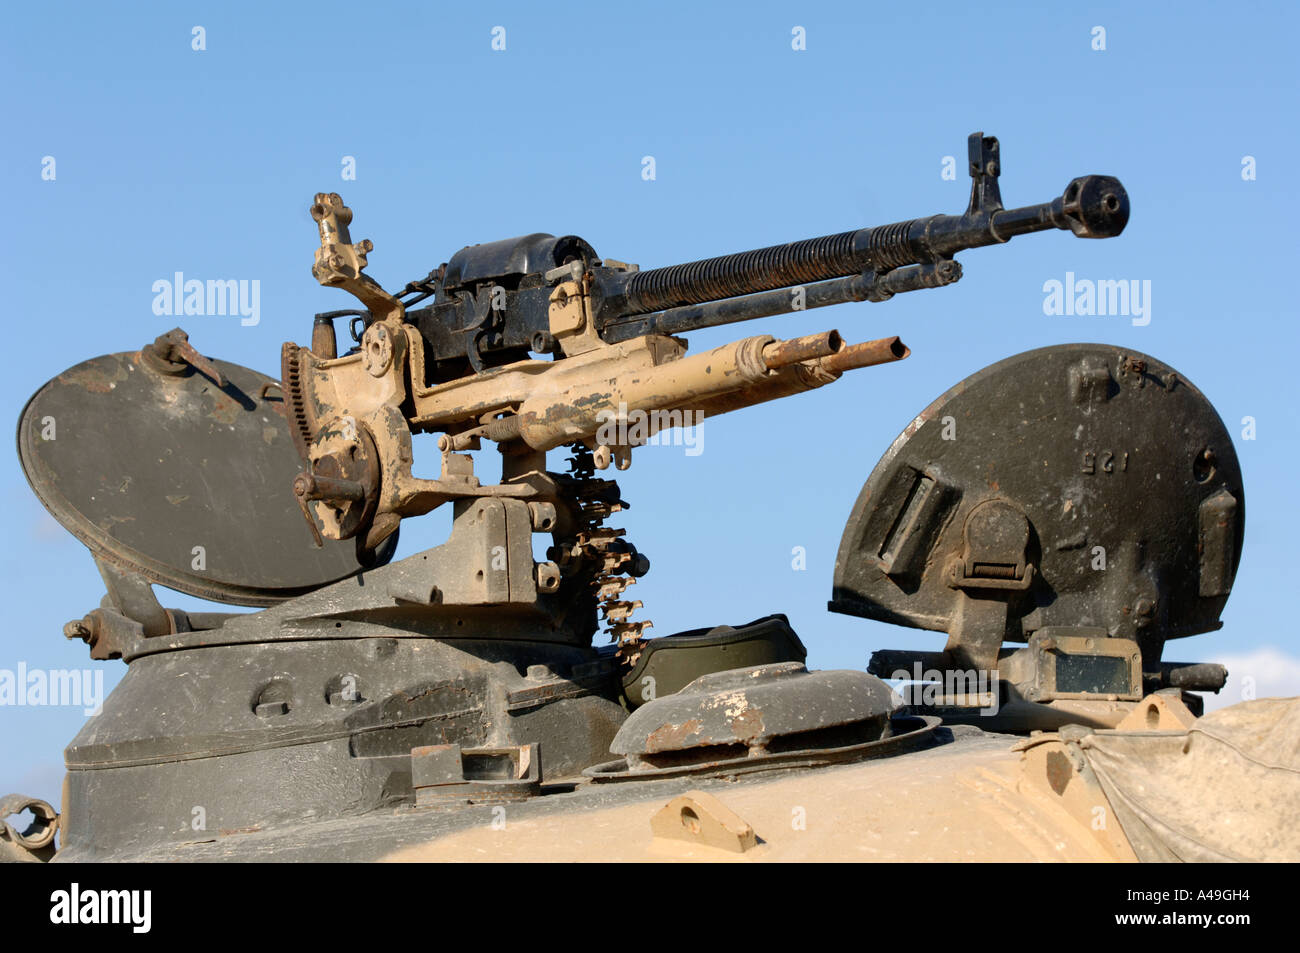 Machine tank